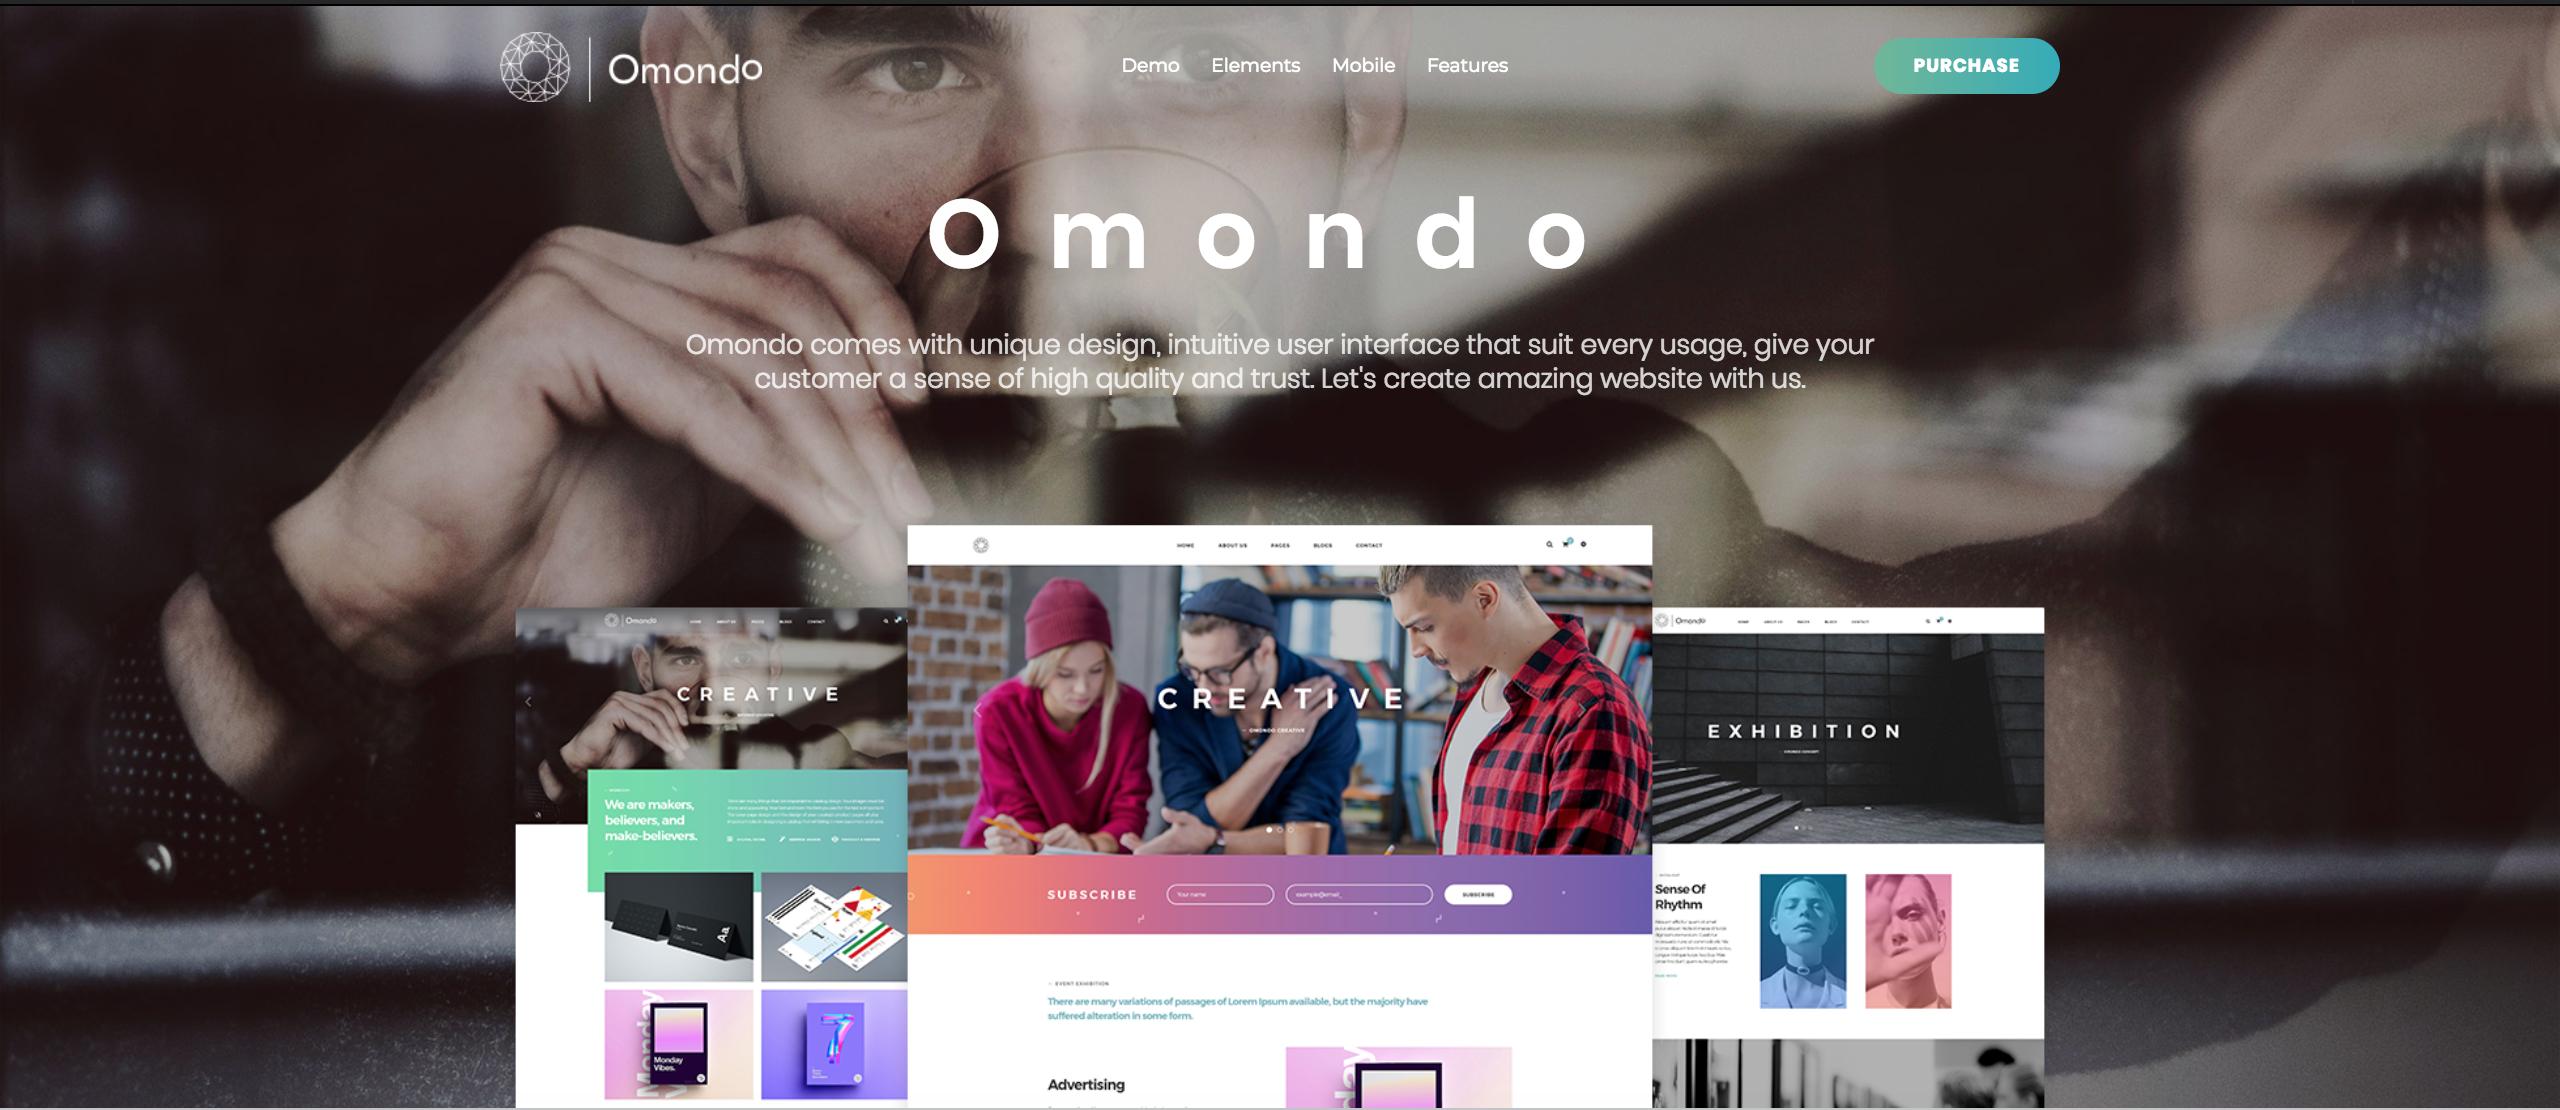 Omondo - Creative Agency Business WordPress Theme